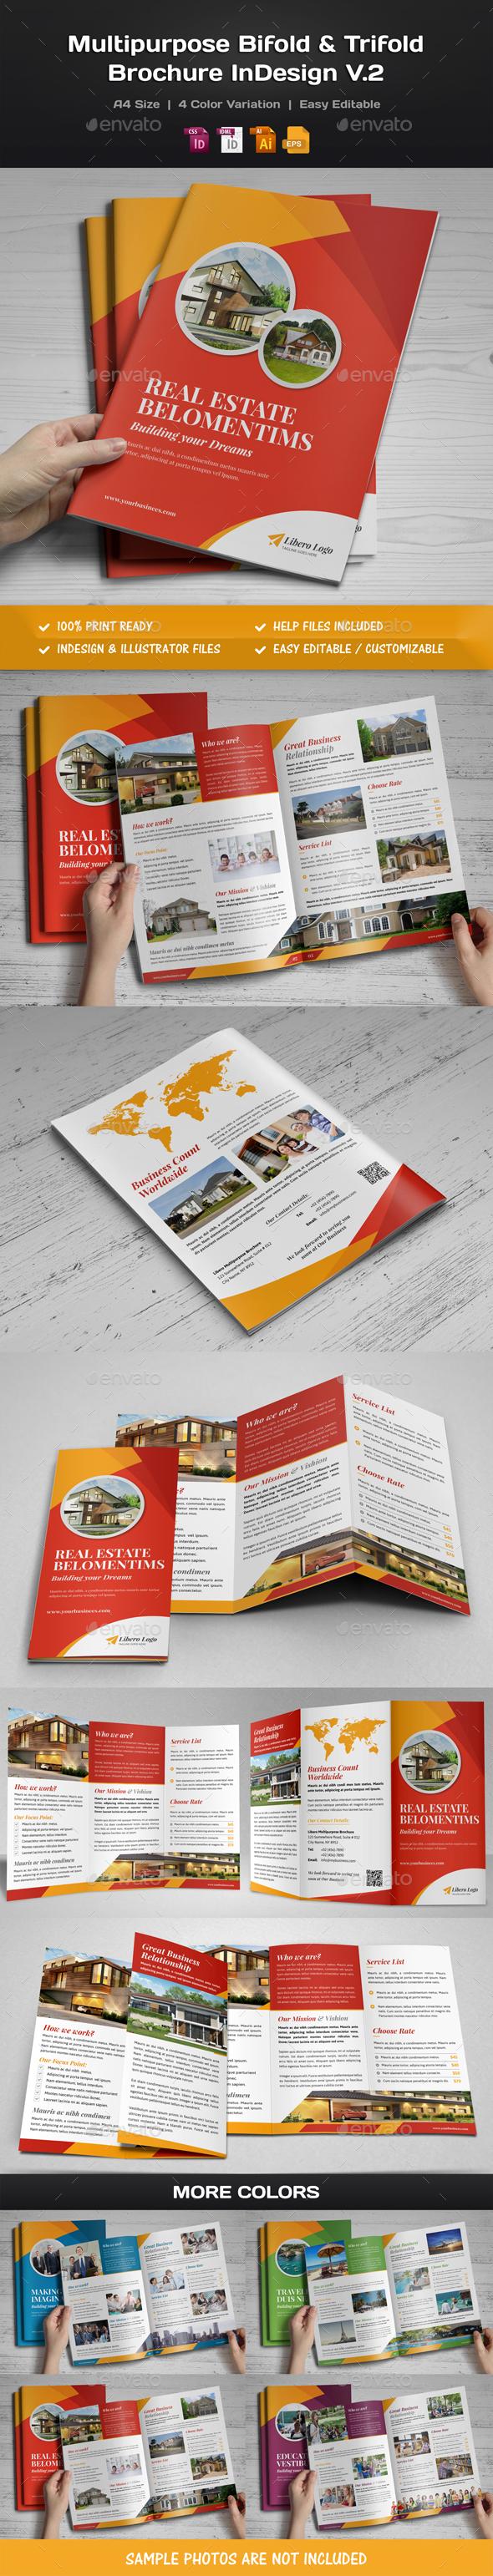 Multipurpose Bifold-Trifold Brochure v2 - Corporate Brochures